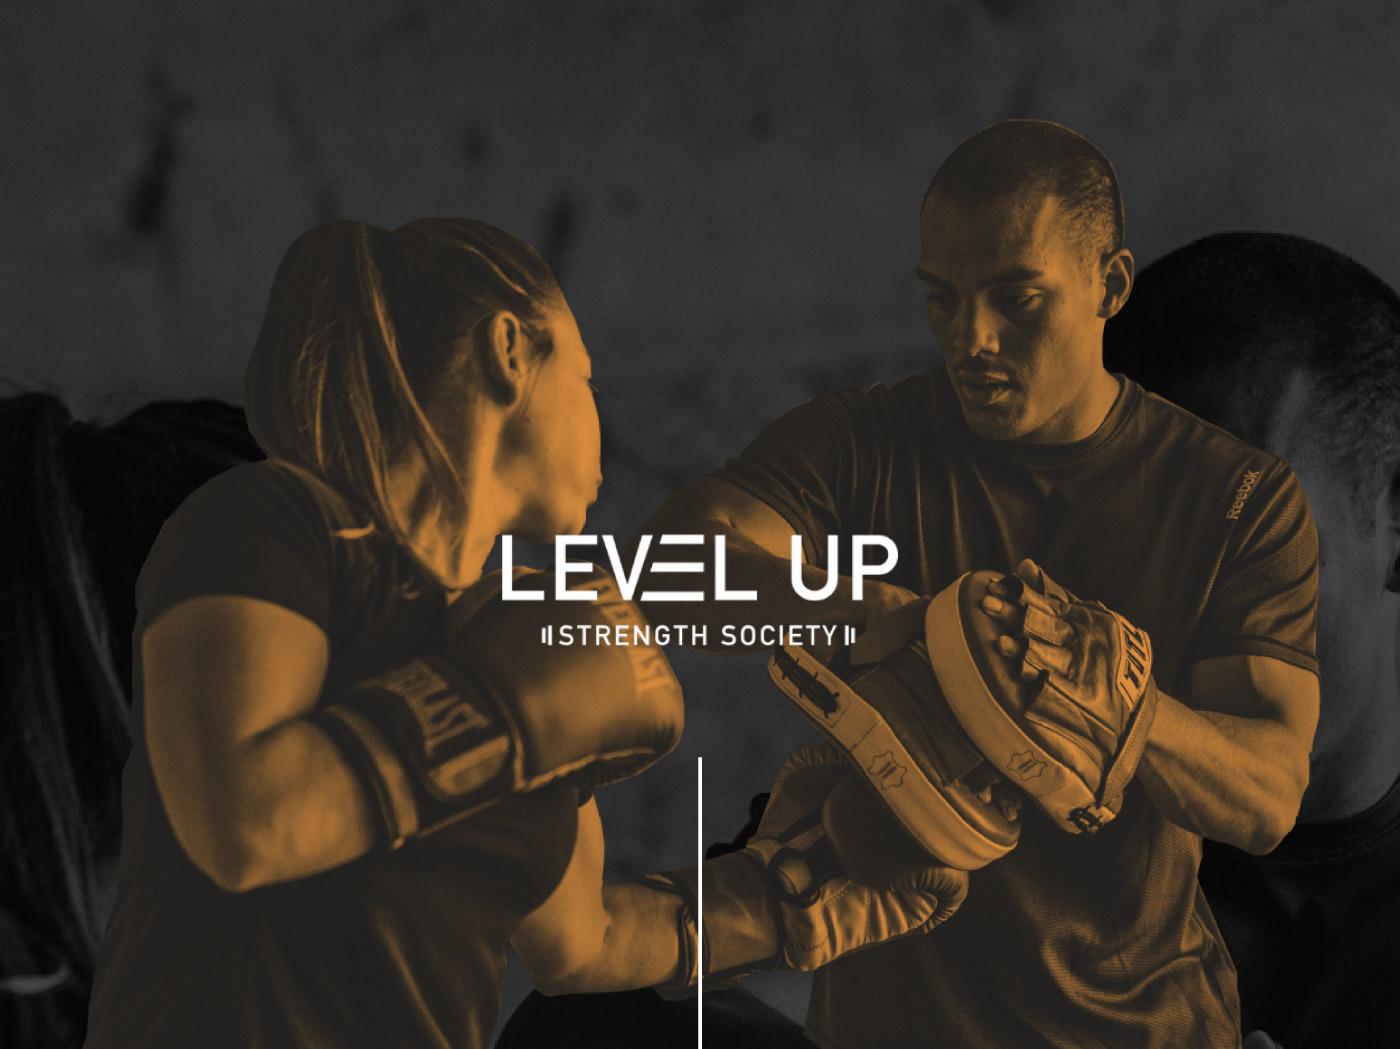 Level Up Strength Society